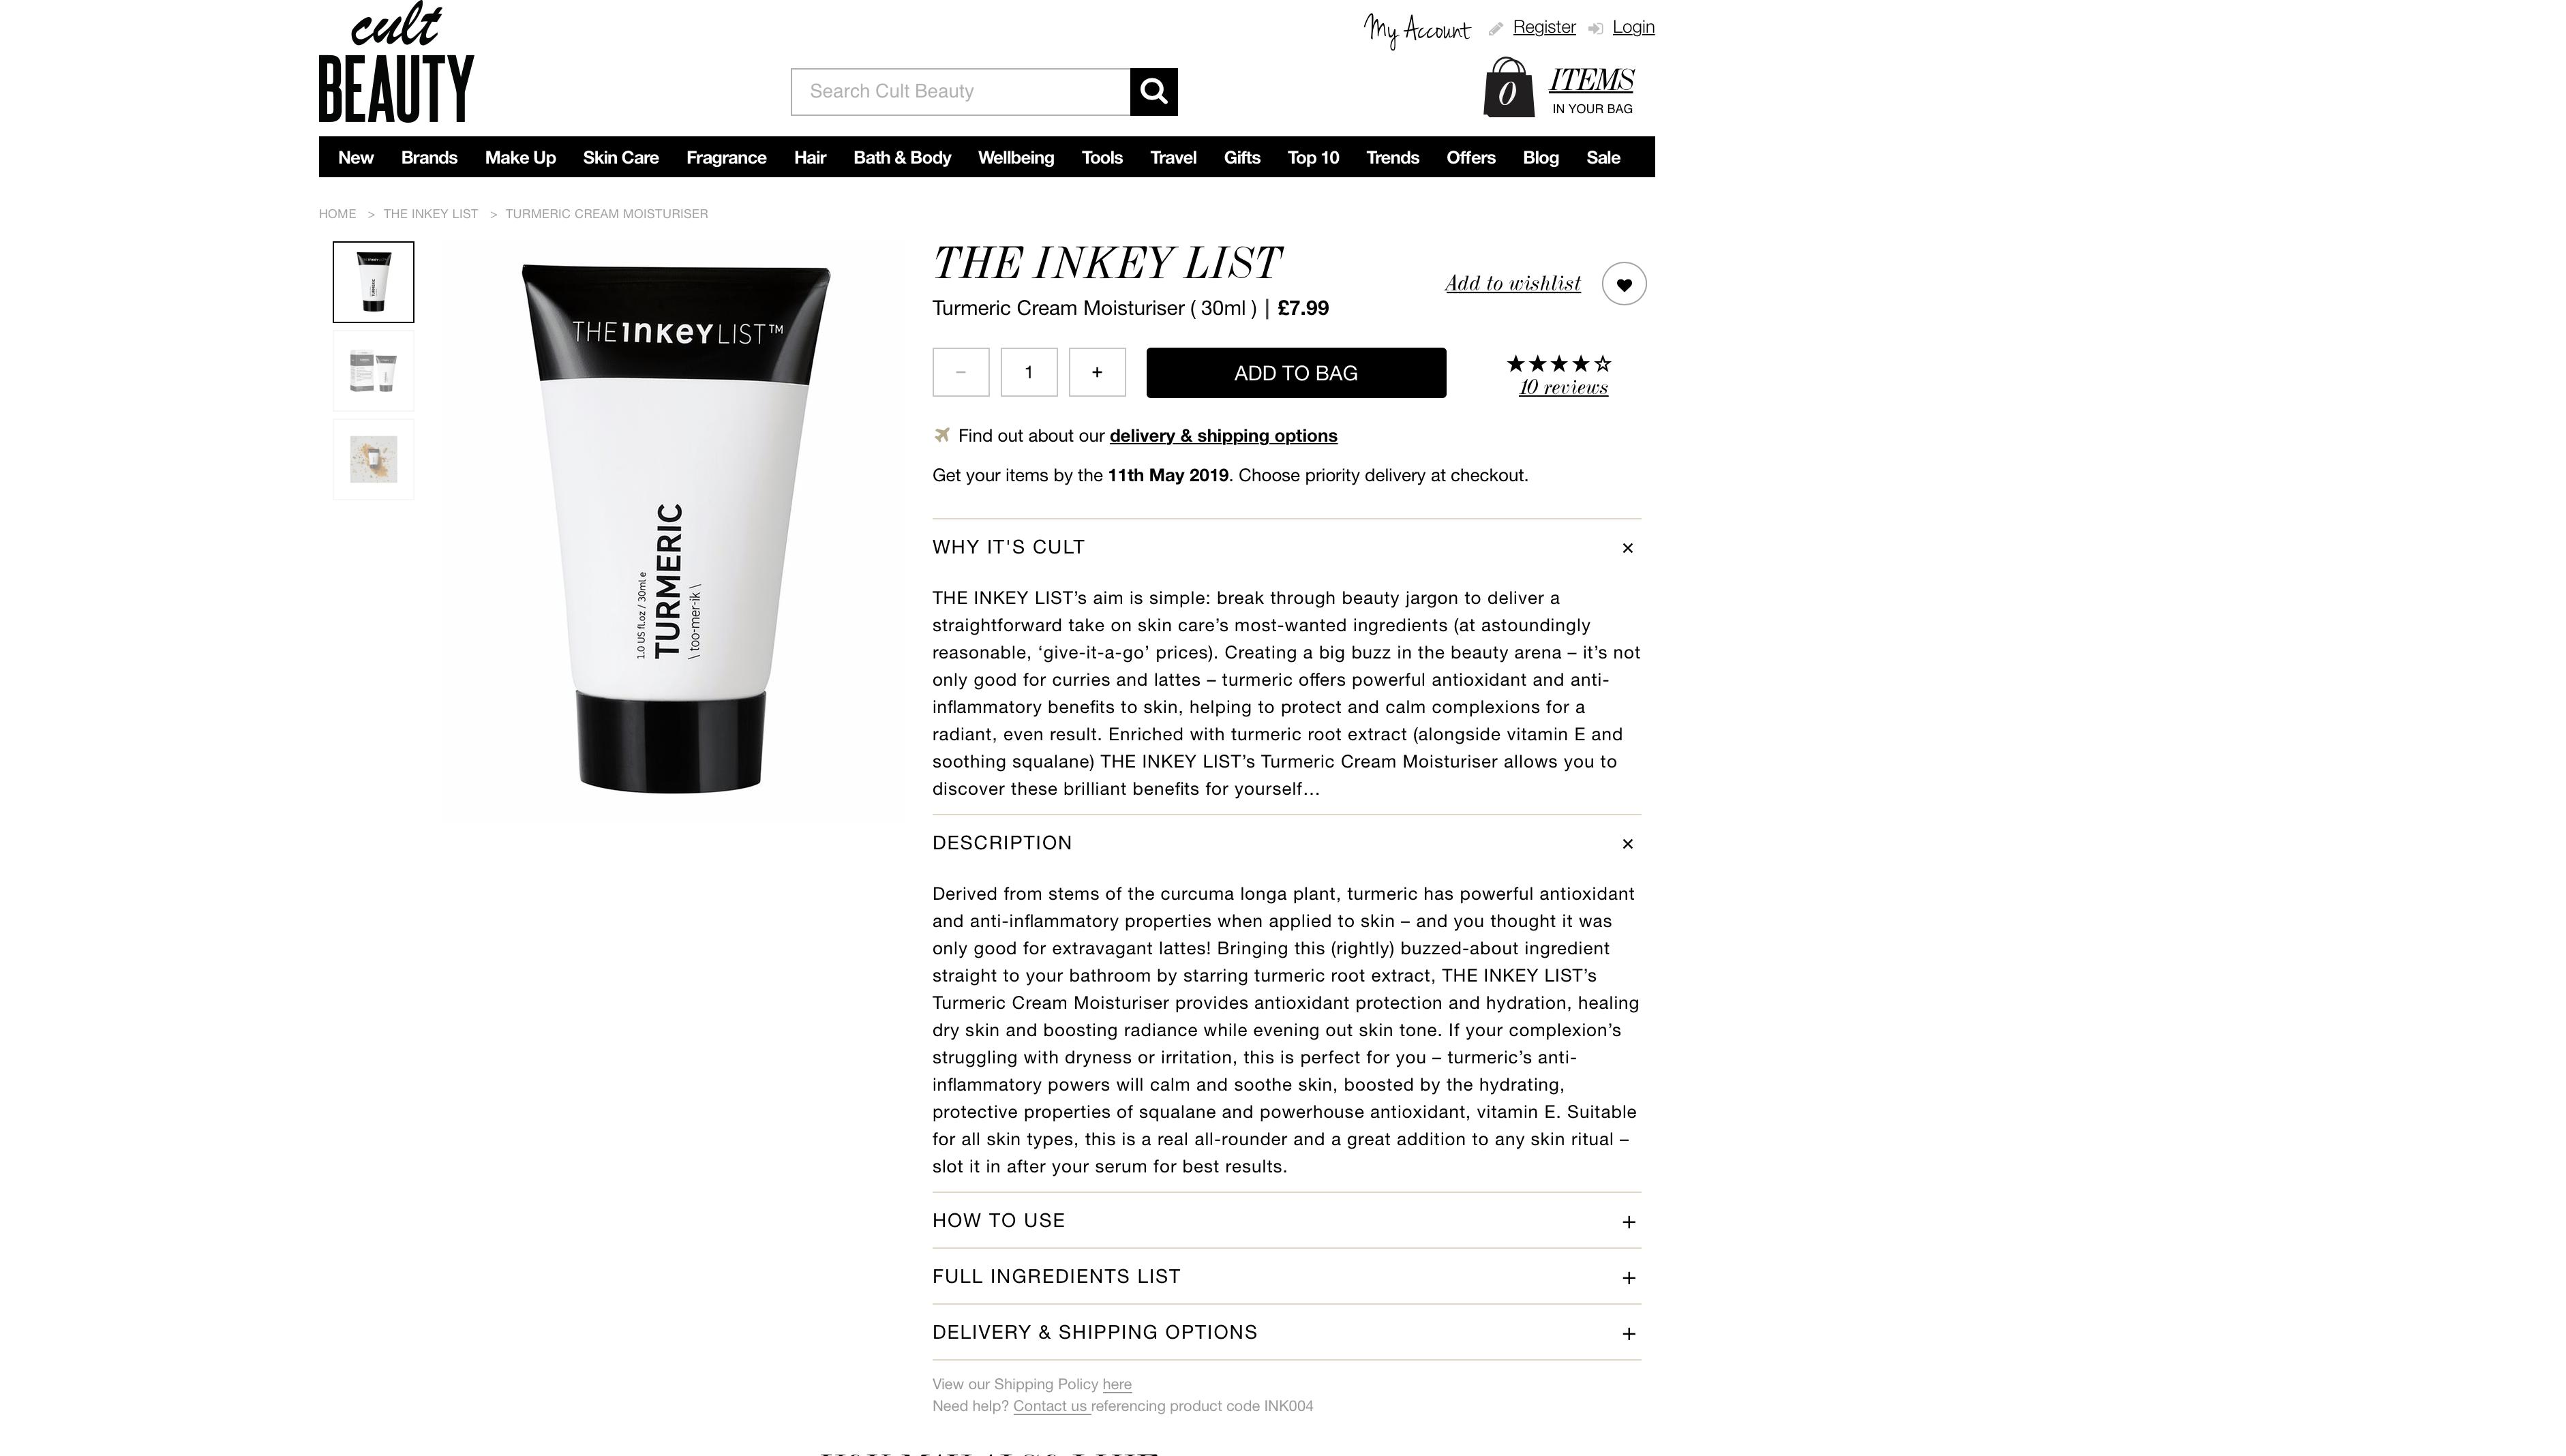 The Inkey List Tumeric Cream Moisturizer